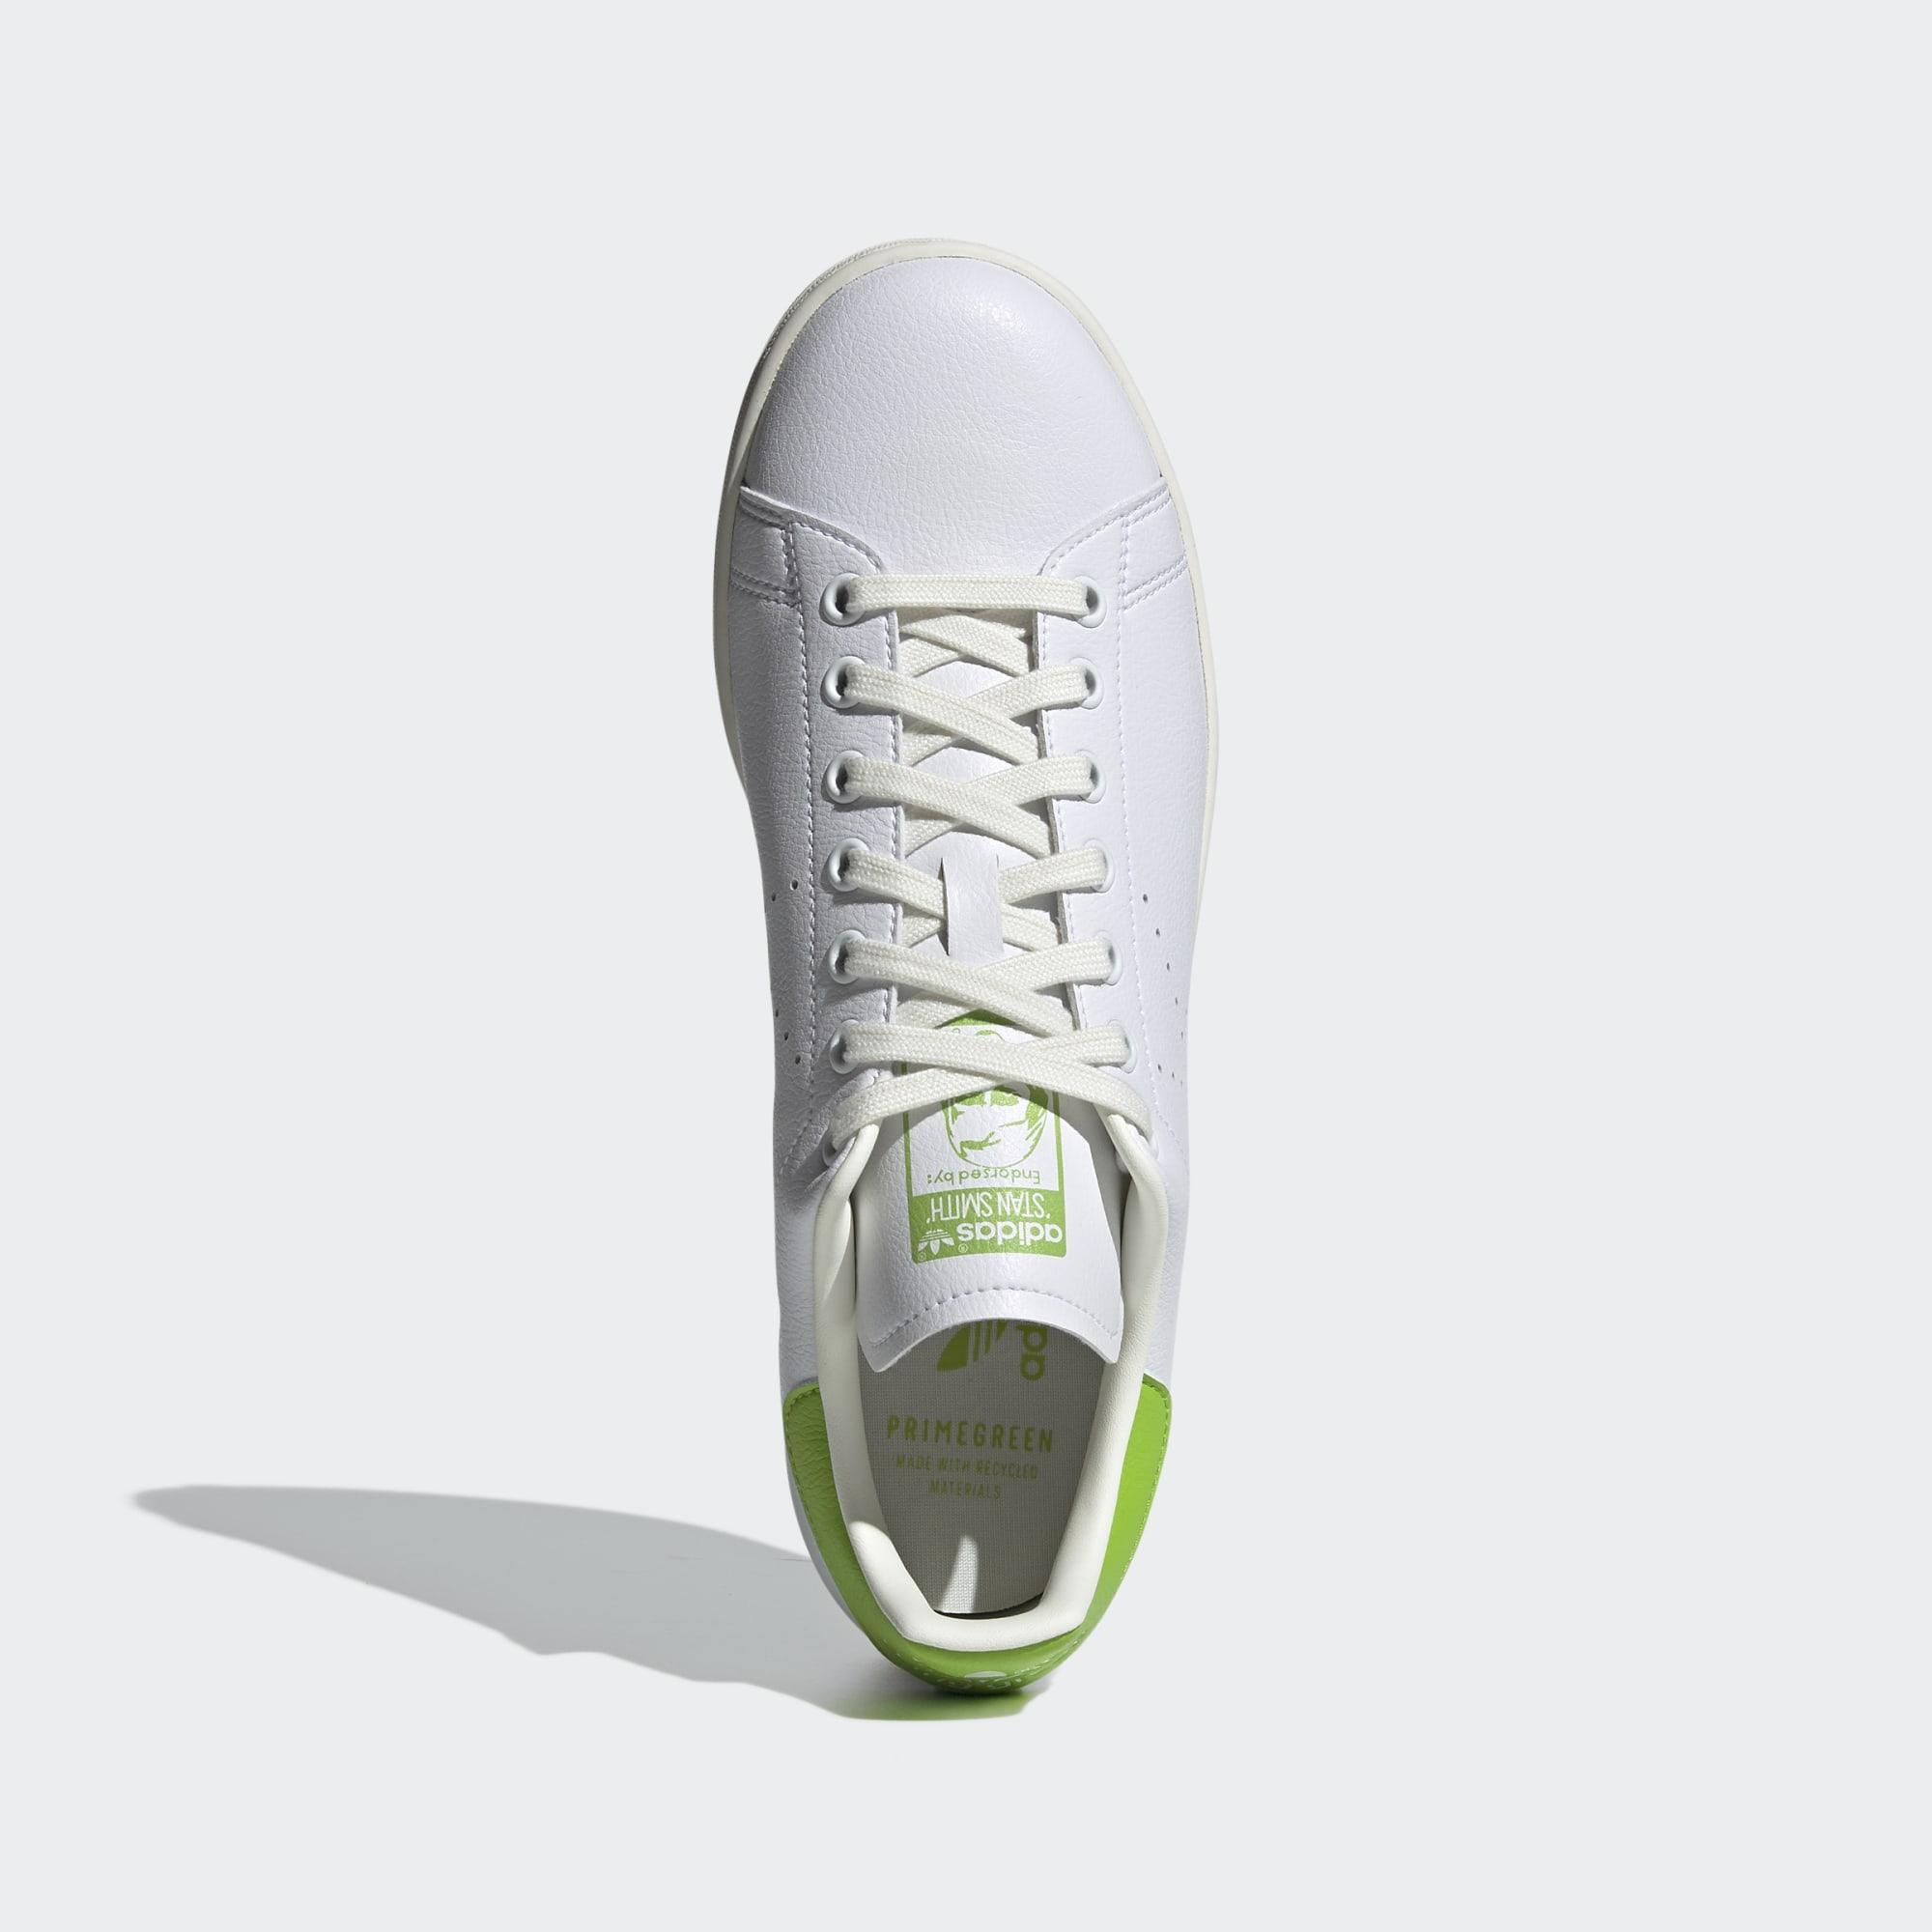 Stan_Smith_Shoes_Vit_FY5460_02_standard.jpg